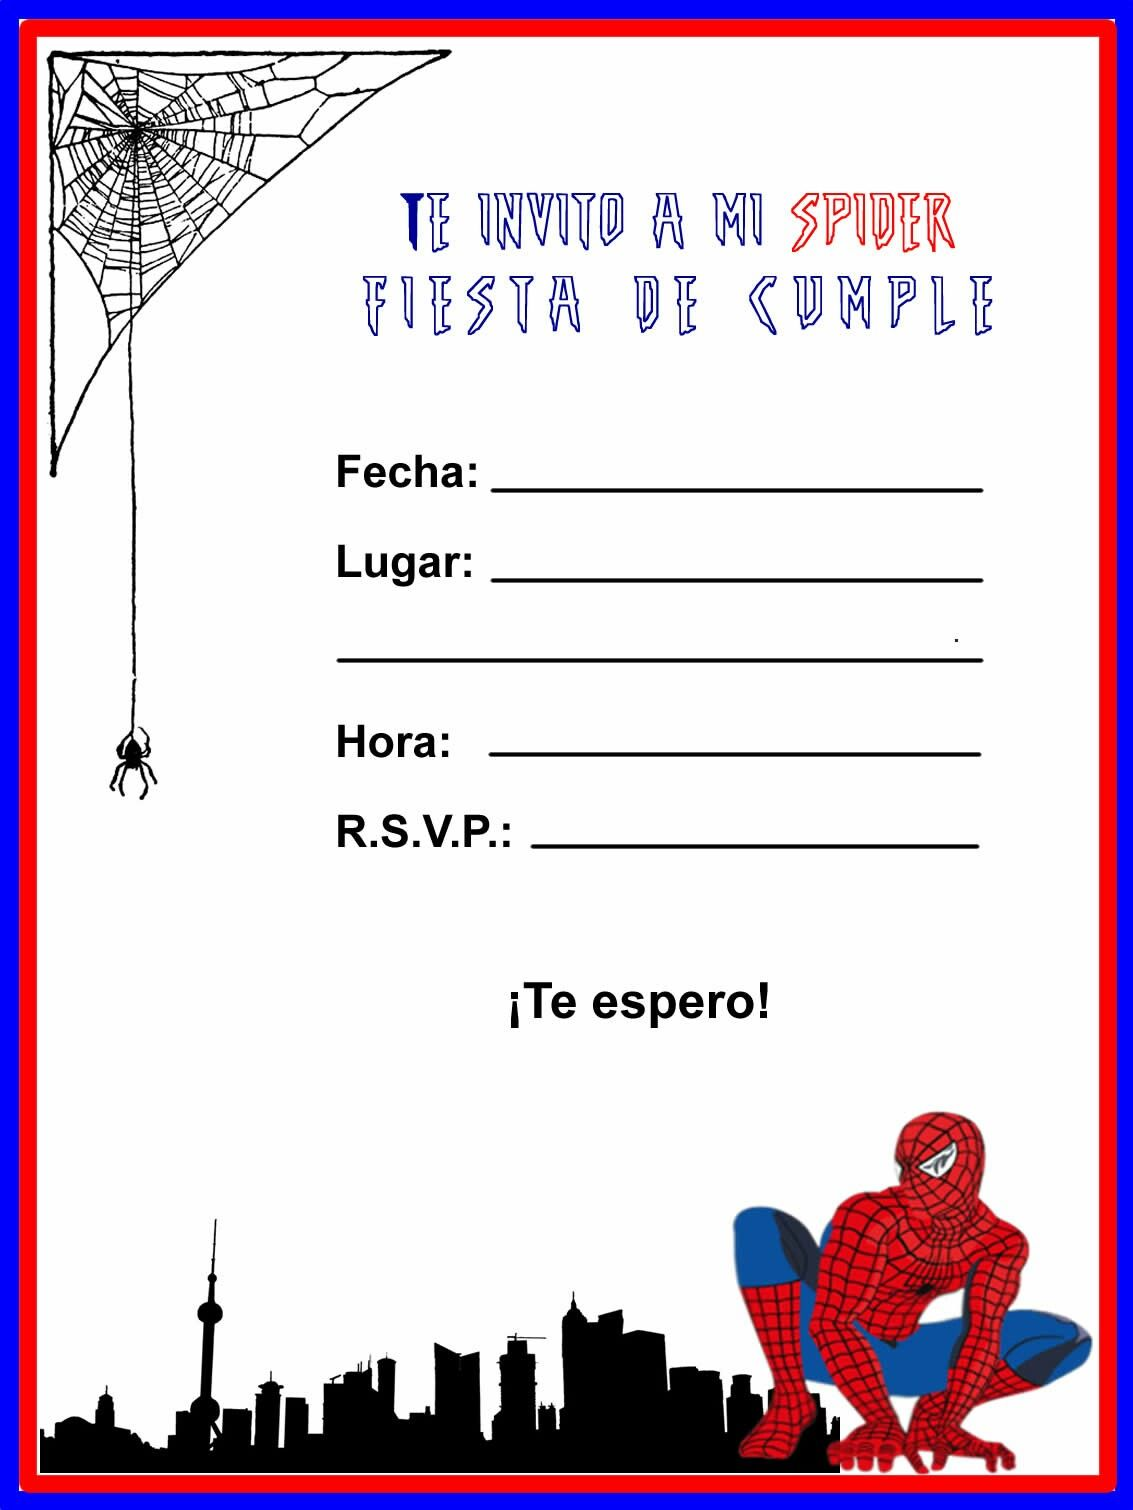 Pin de Diana Carolina en tarjetas Cumpleaños hombre araña, Tarjeta de cumpleaños hombre y